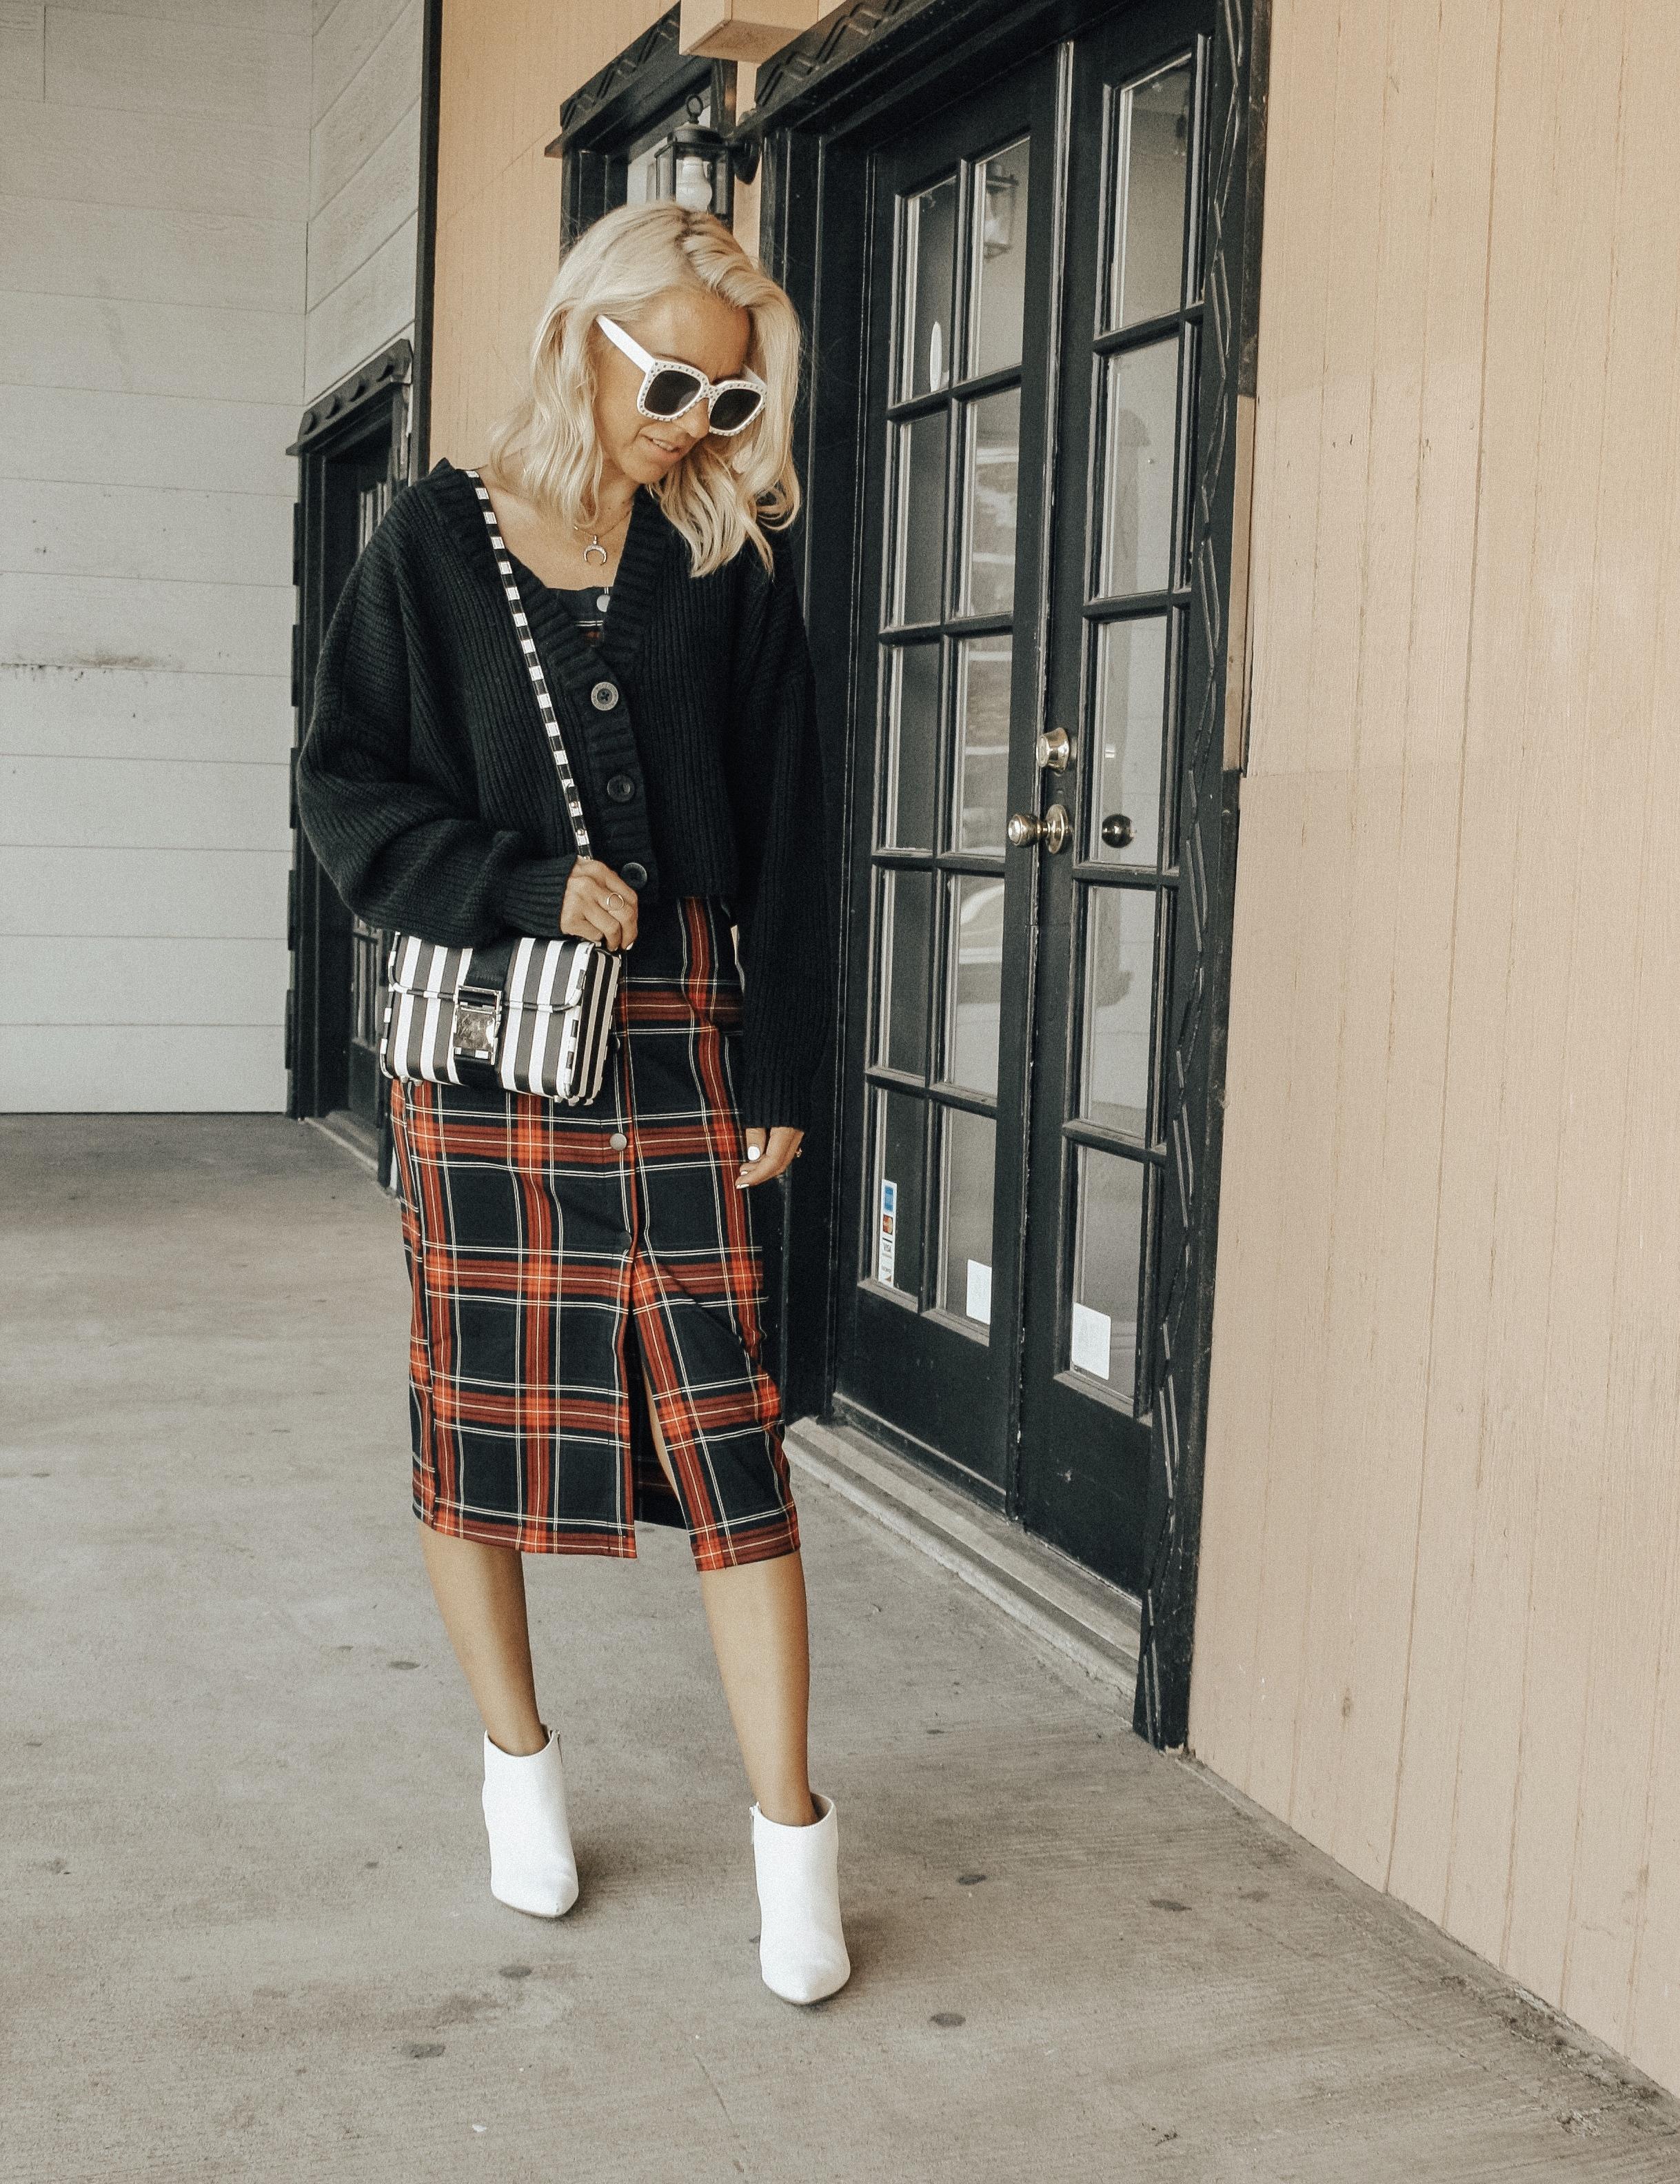 MAD FOR PLAID- Jaclyn De Leon Style + fall fashion + plaid dress + street style + style inspo + cozy sweater cardigan + white boots + striped handbag + 90's fashion + retro style + mom style + asos